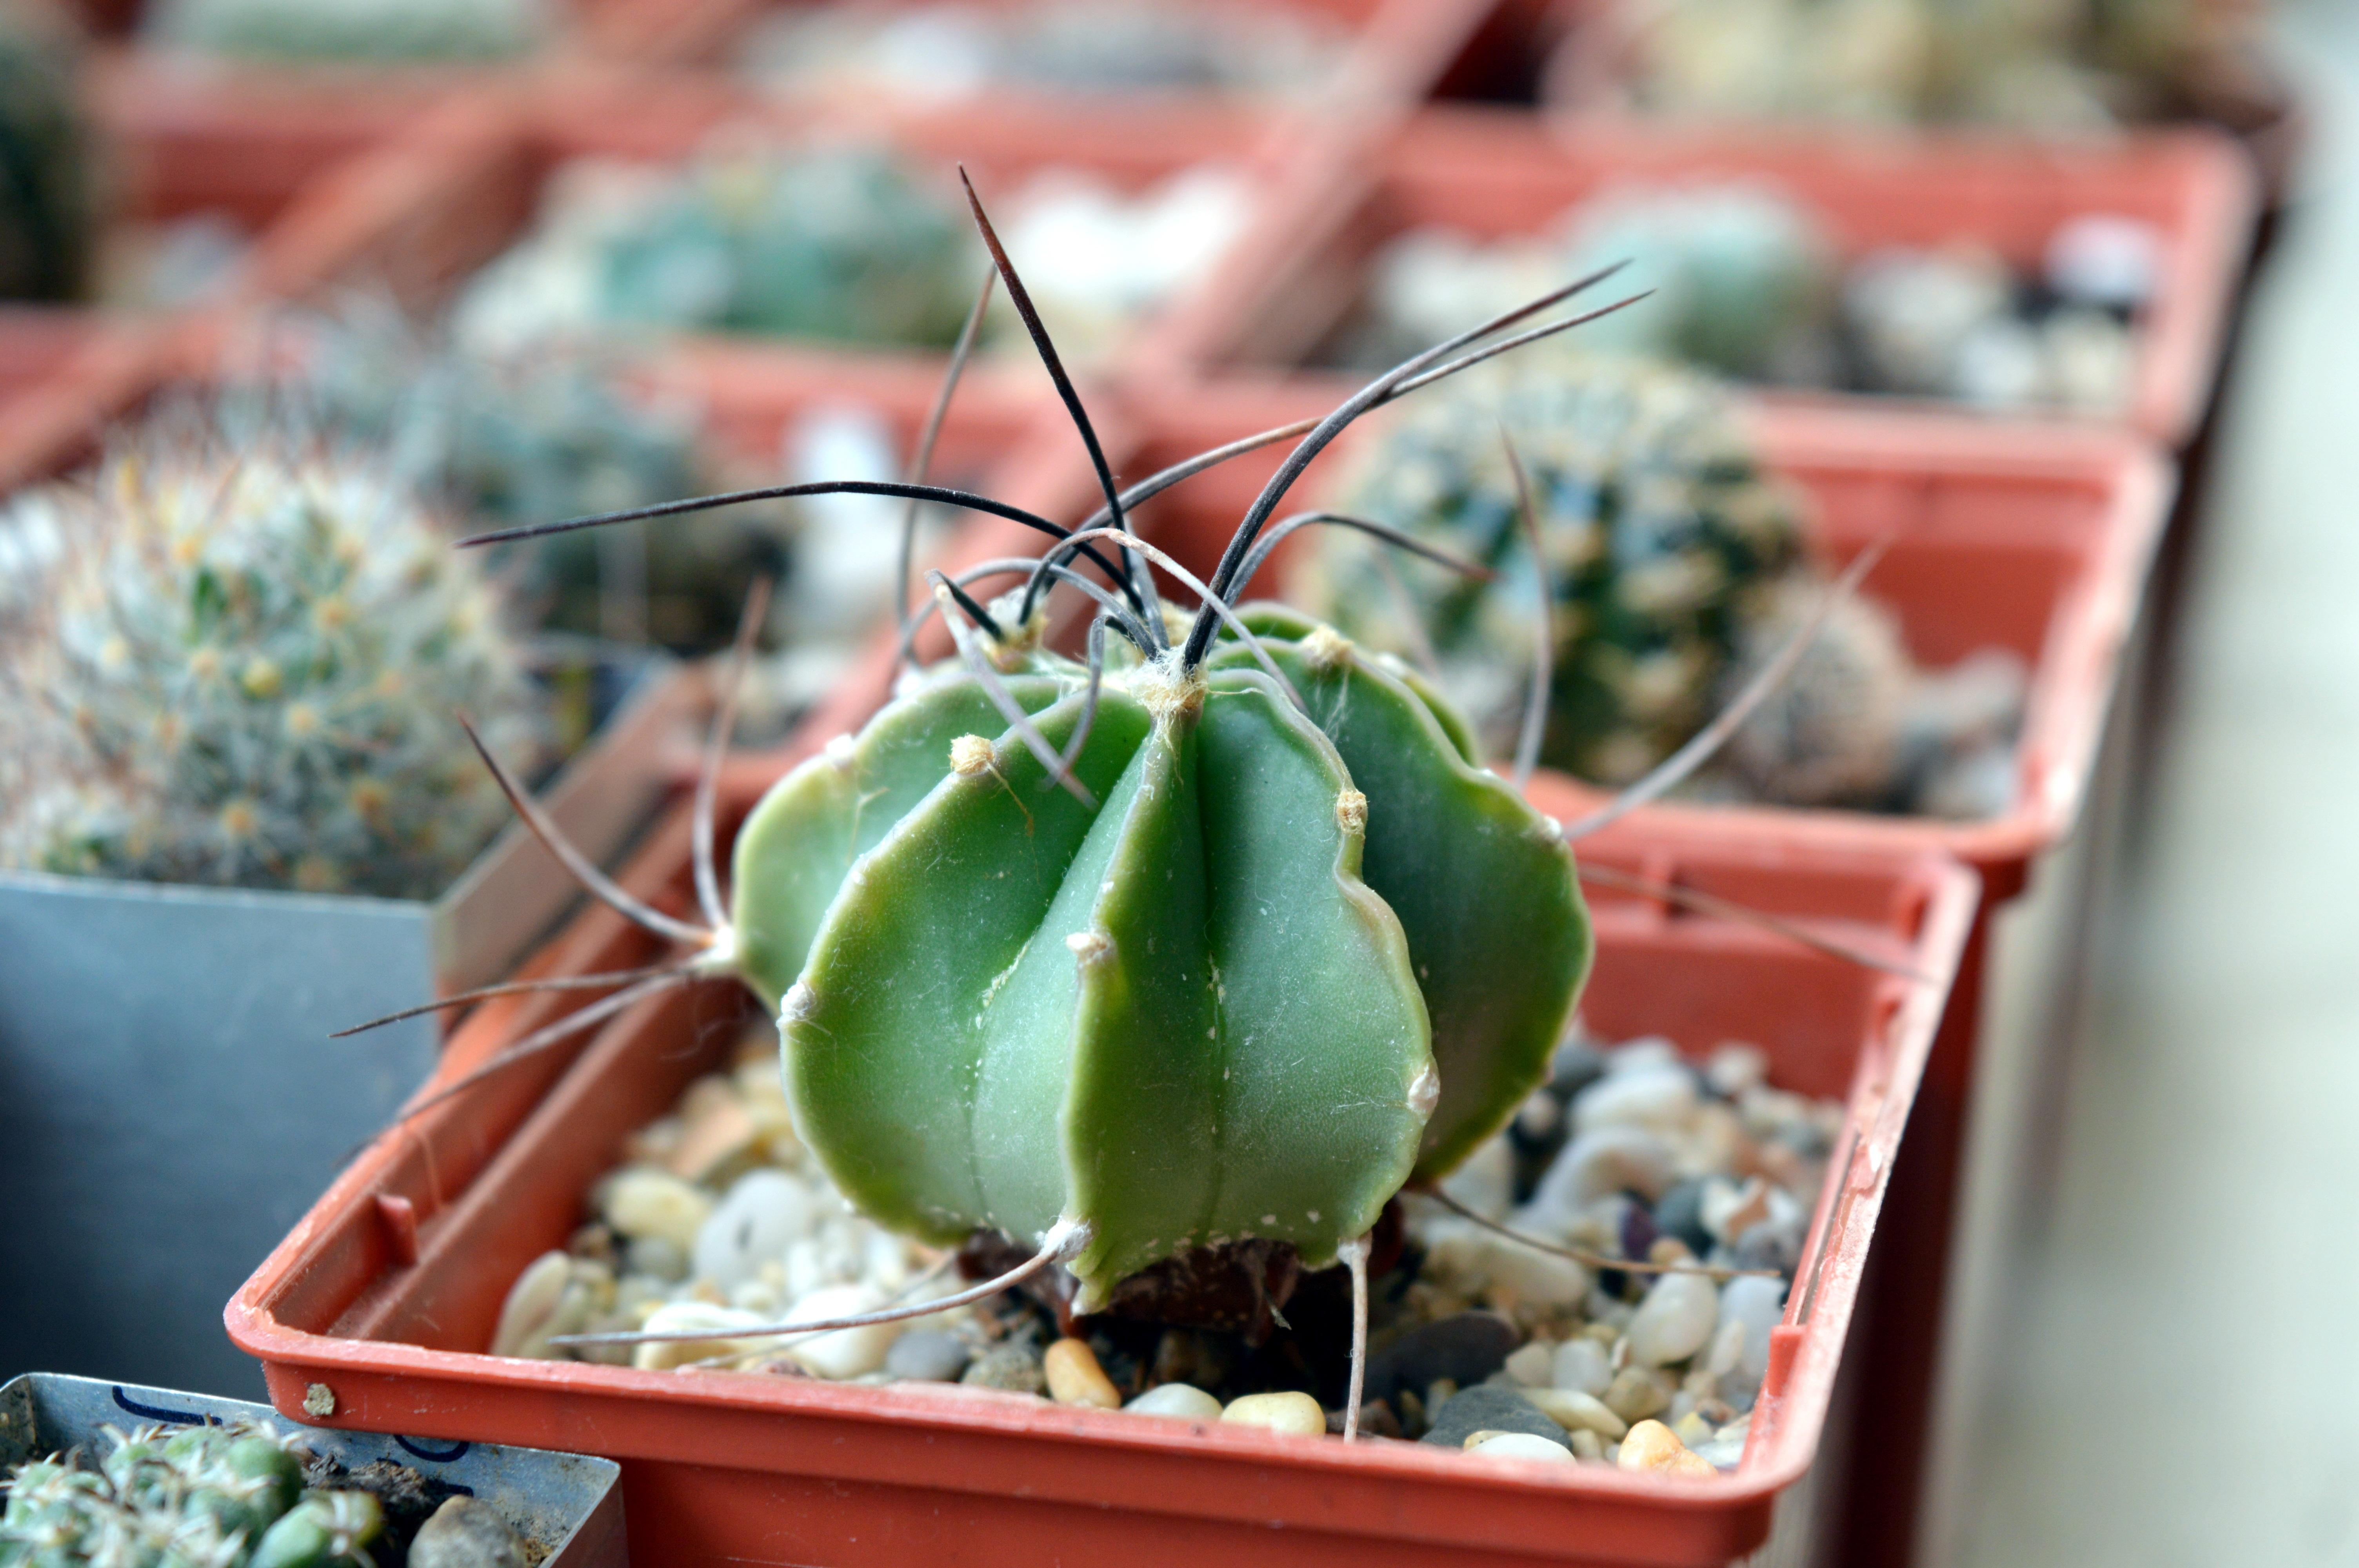 images gratuites cactus fleur aliments vert. Black Bedroom Furniture Sets. Home Design Ideas